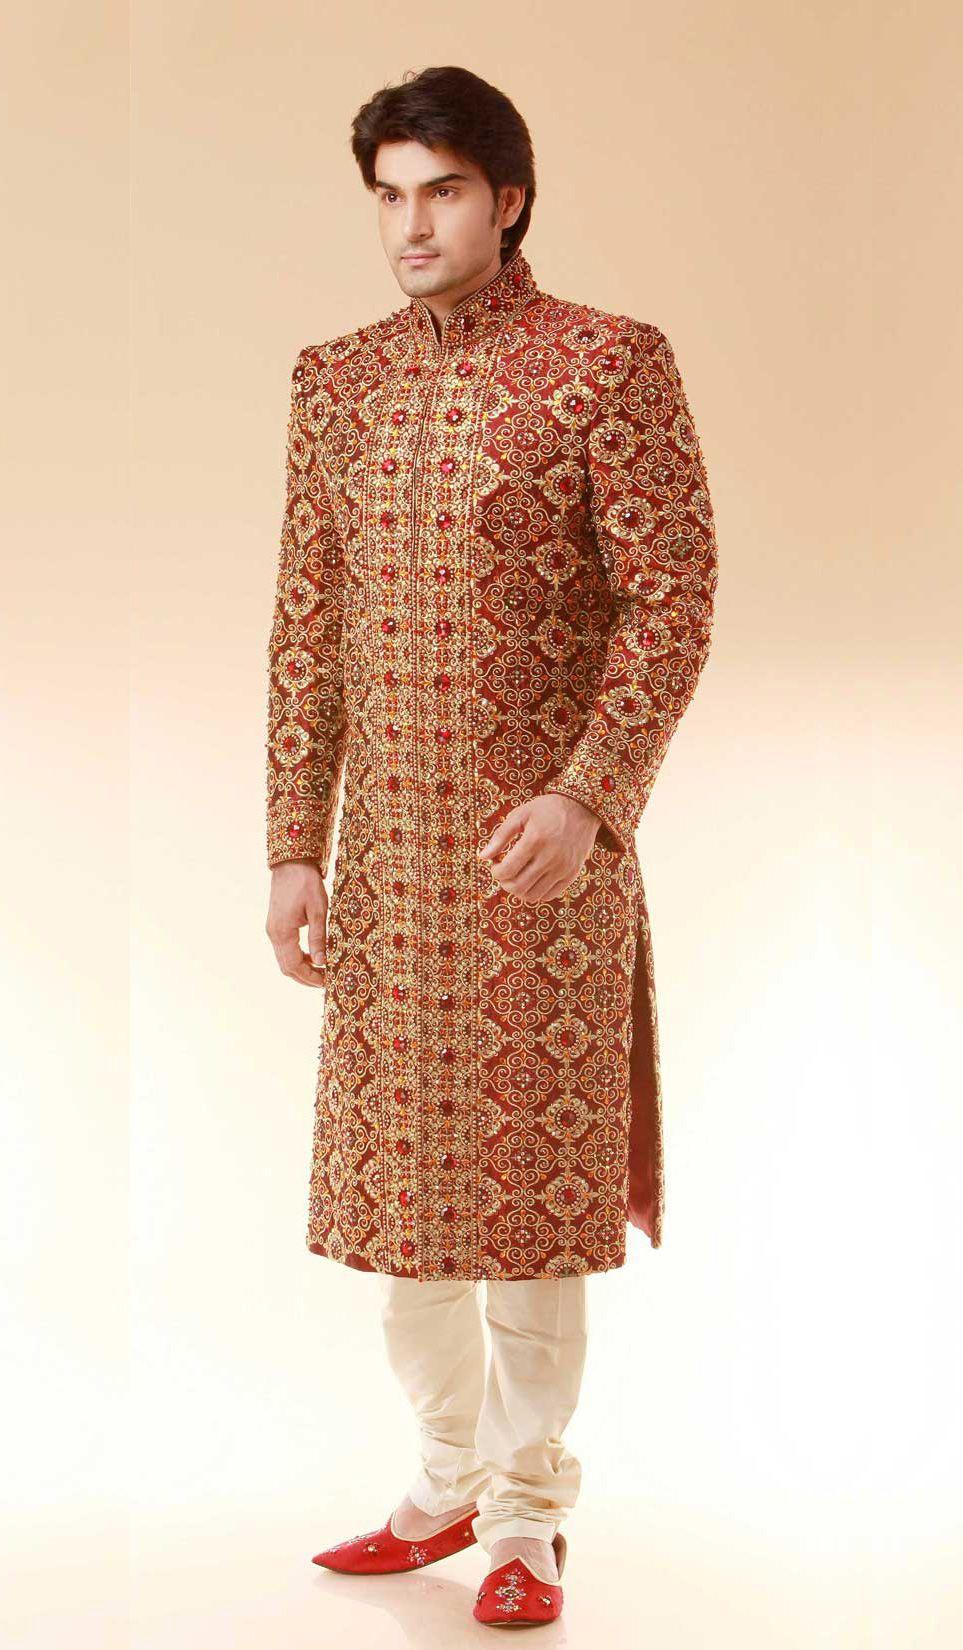 Maroon-Satin-Brocade-Embroidered-Designer-Indian-wedding-sherwani ...